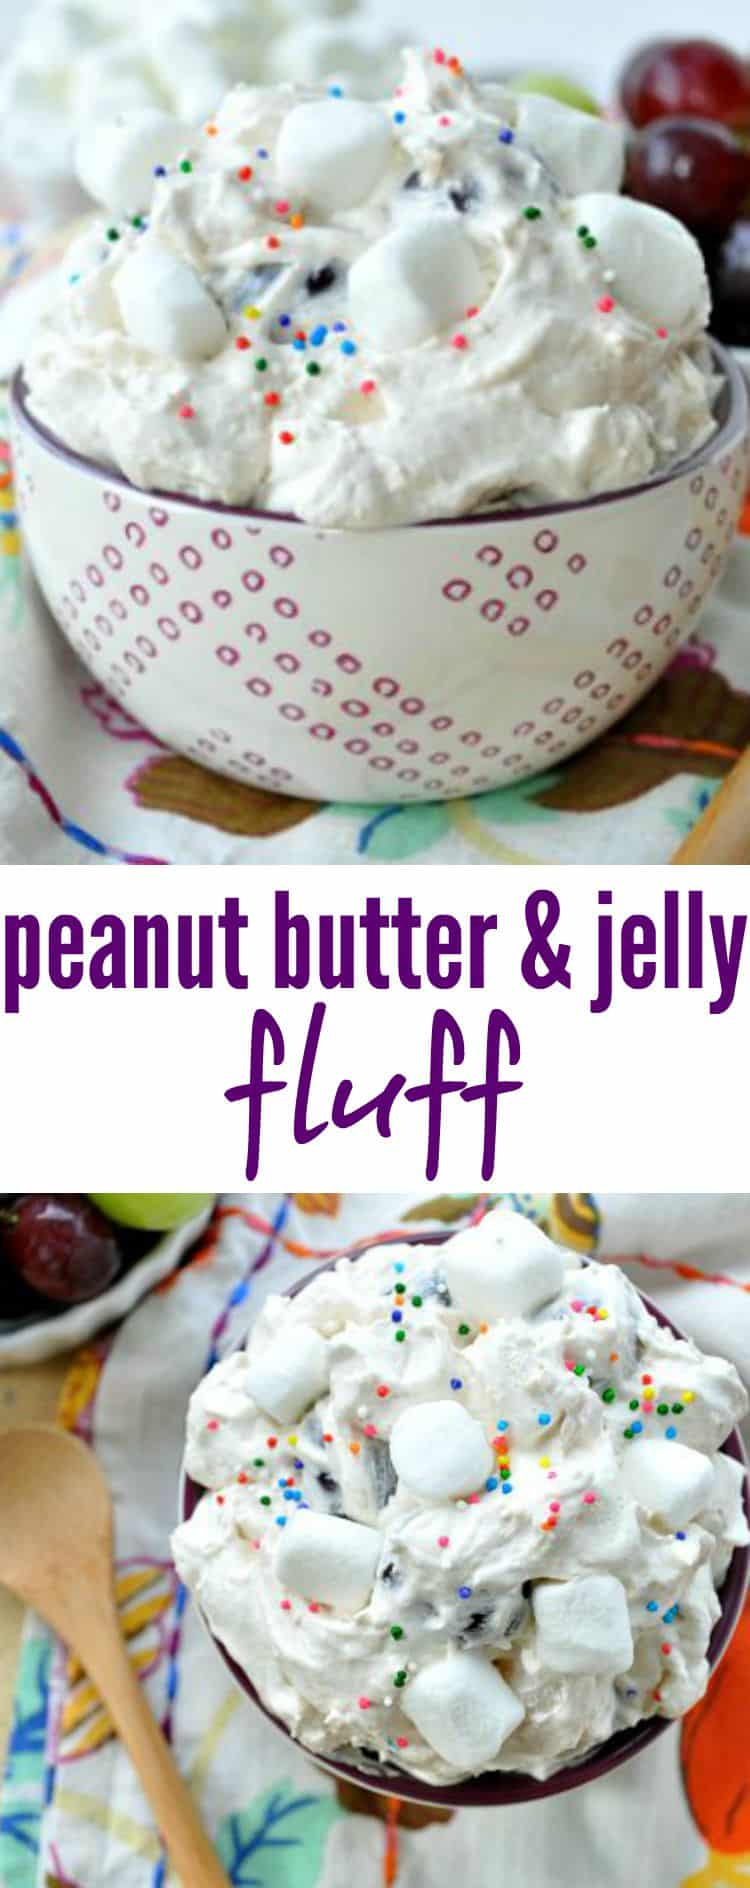 Peanut Butter & Jelly Fluff